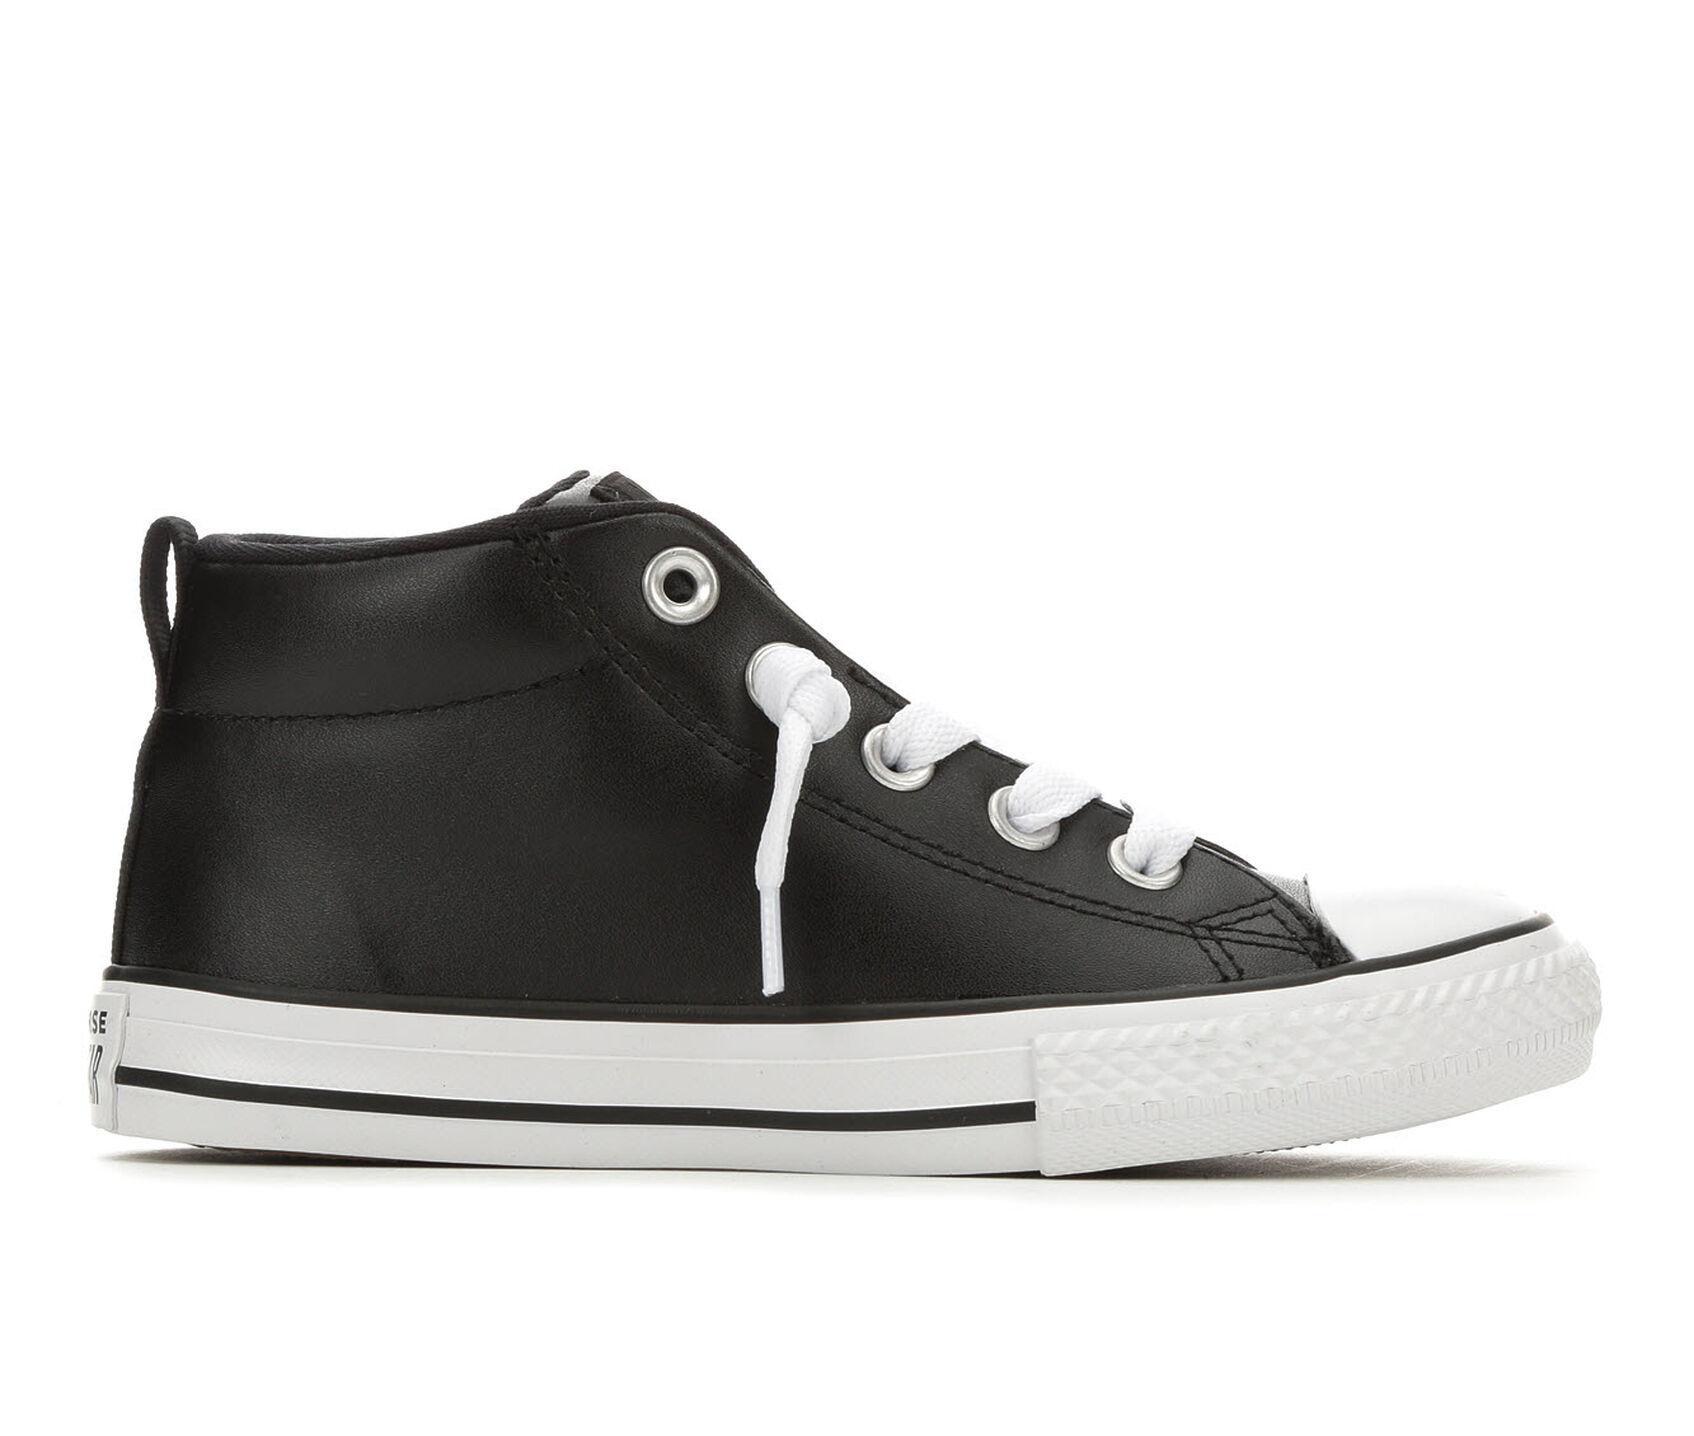 Los Angeles wylot złapać Boys' Converse Little Kid & Big Kid CTAS Street Mid Sneakers